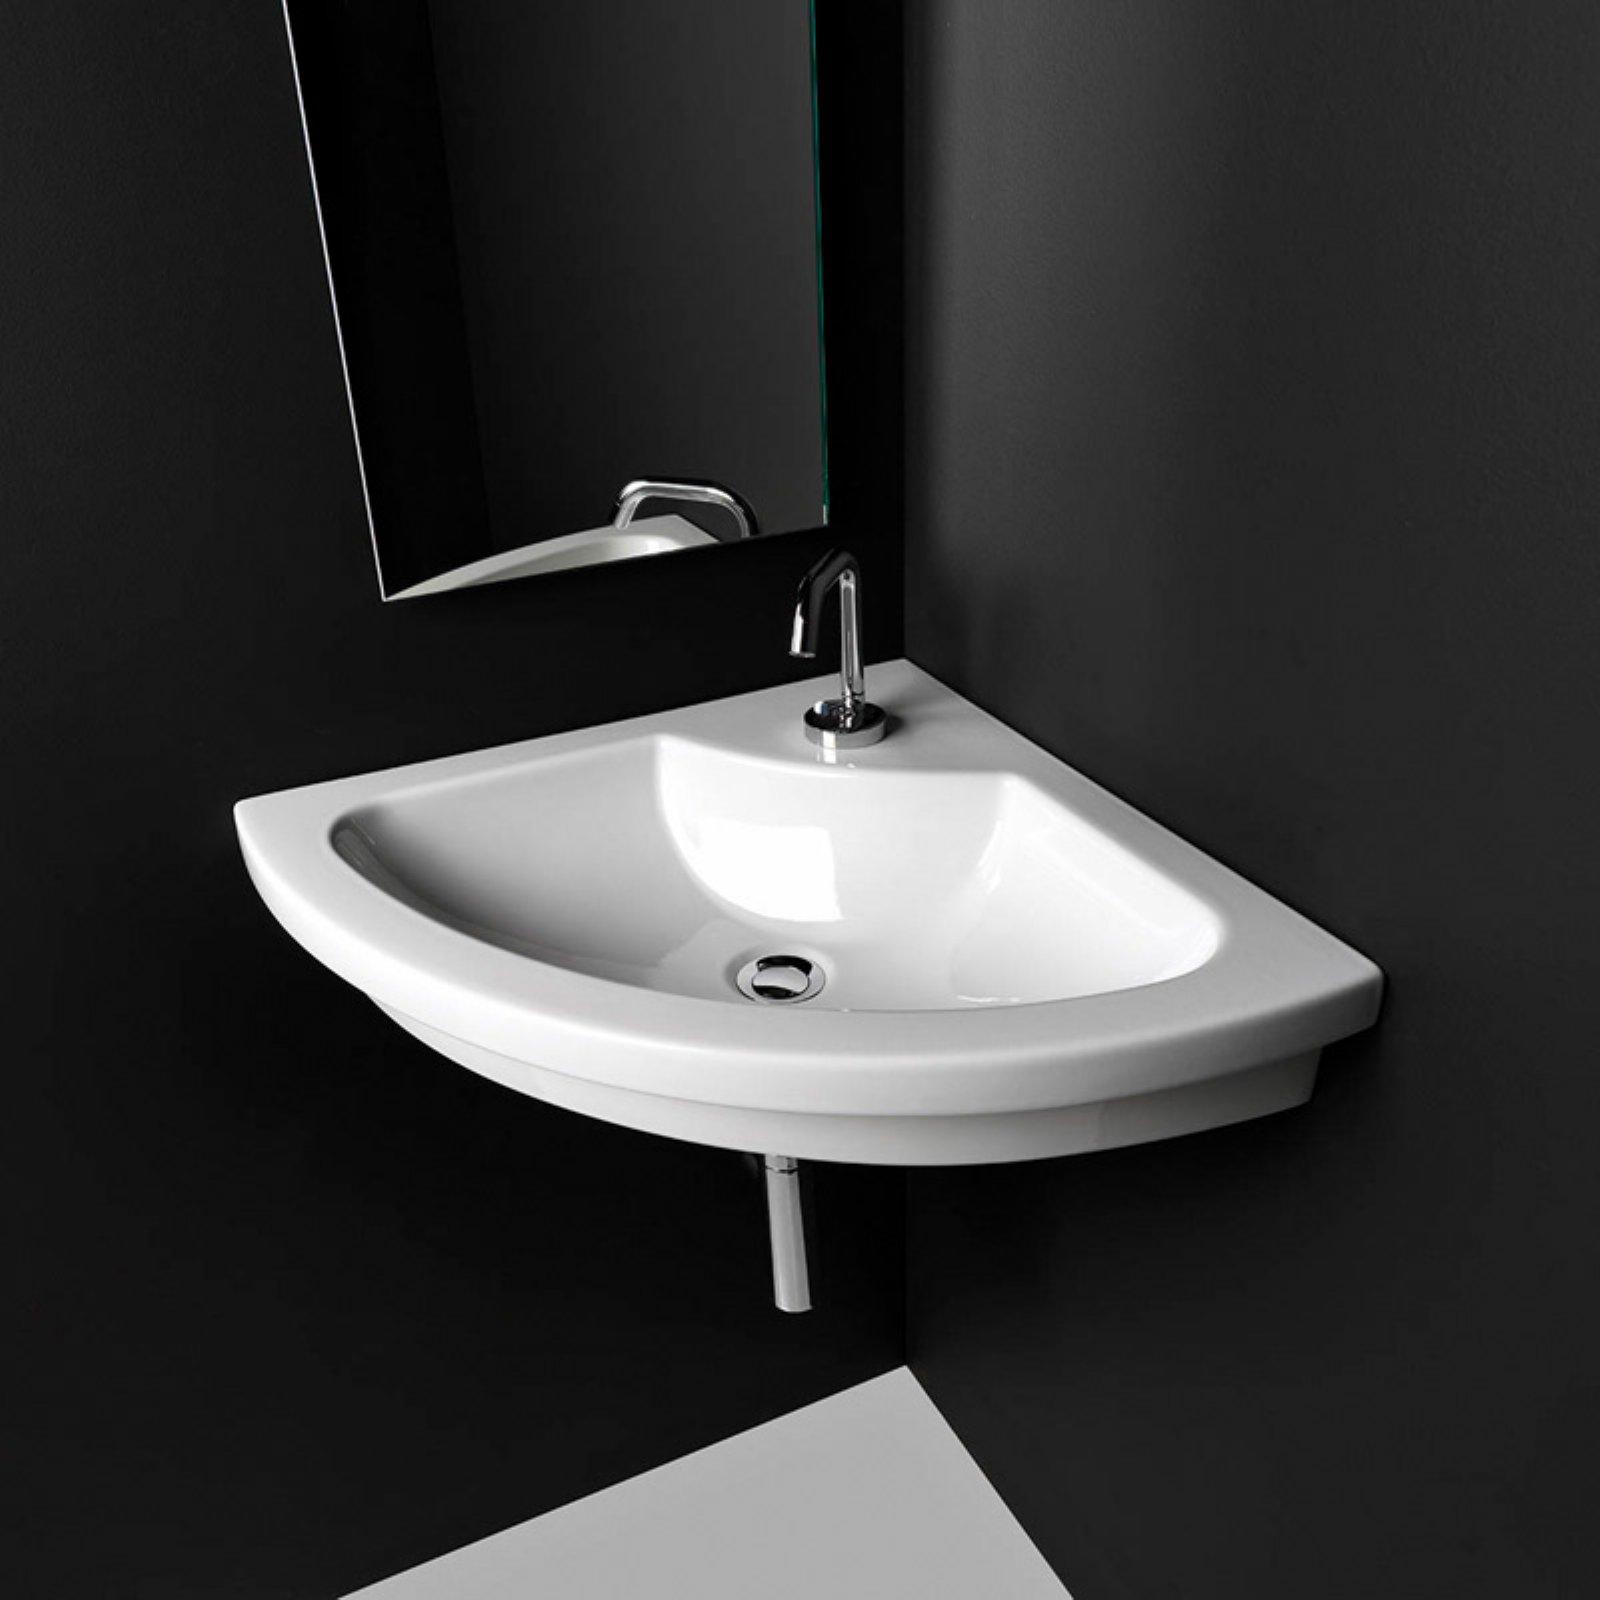 Ws Bath Collections Kart 57 Drop In Bathroom Corner Sink